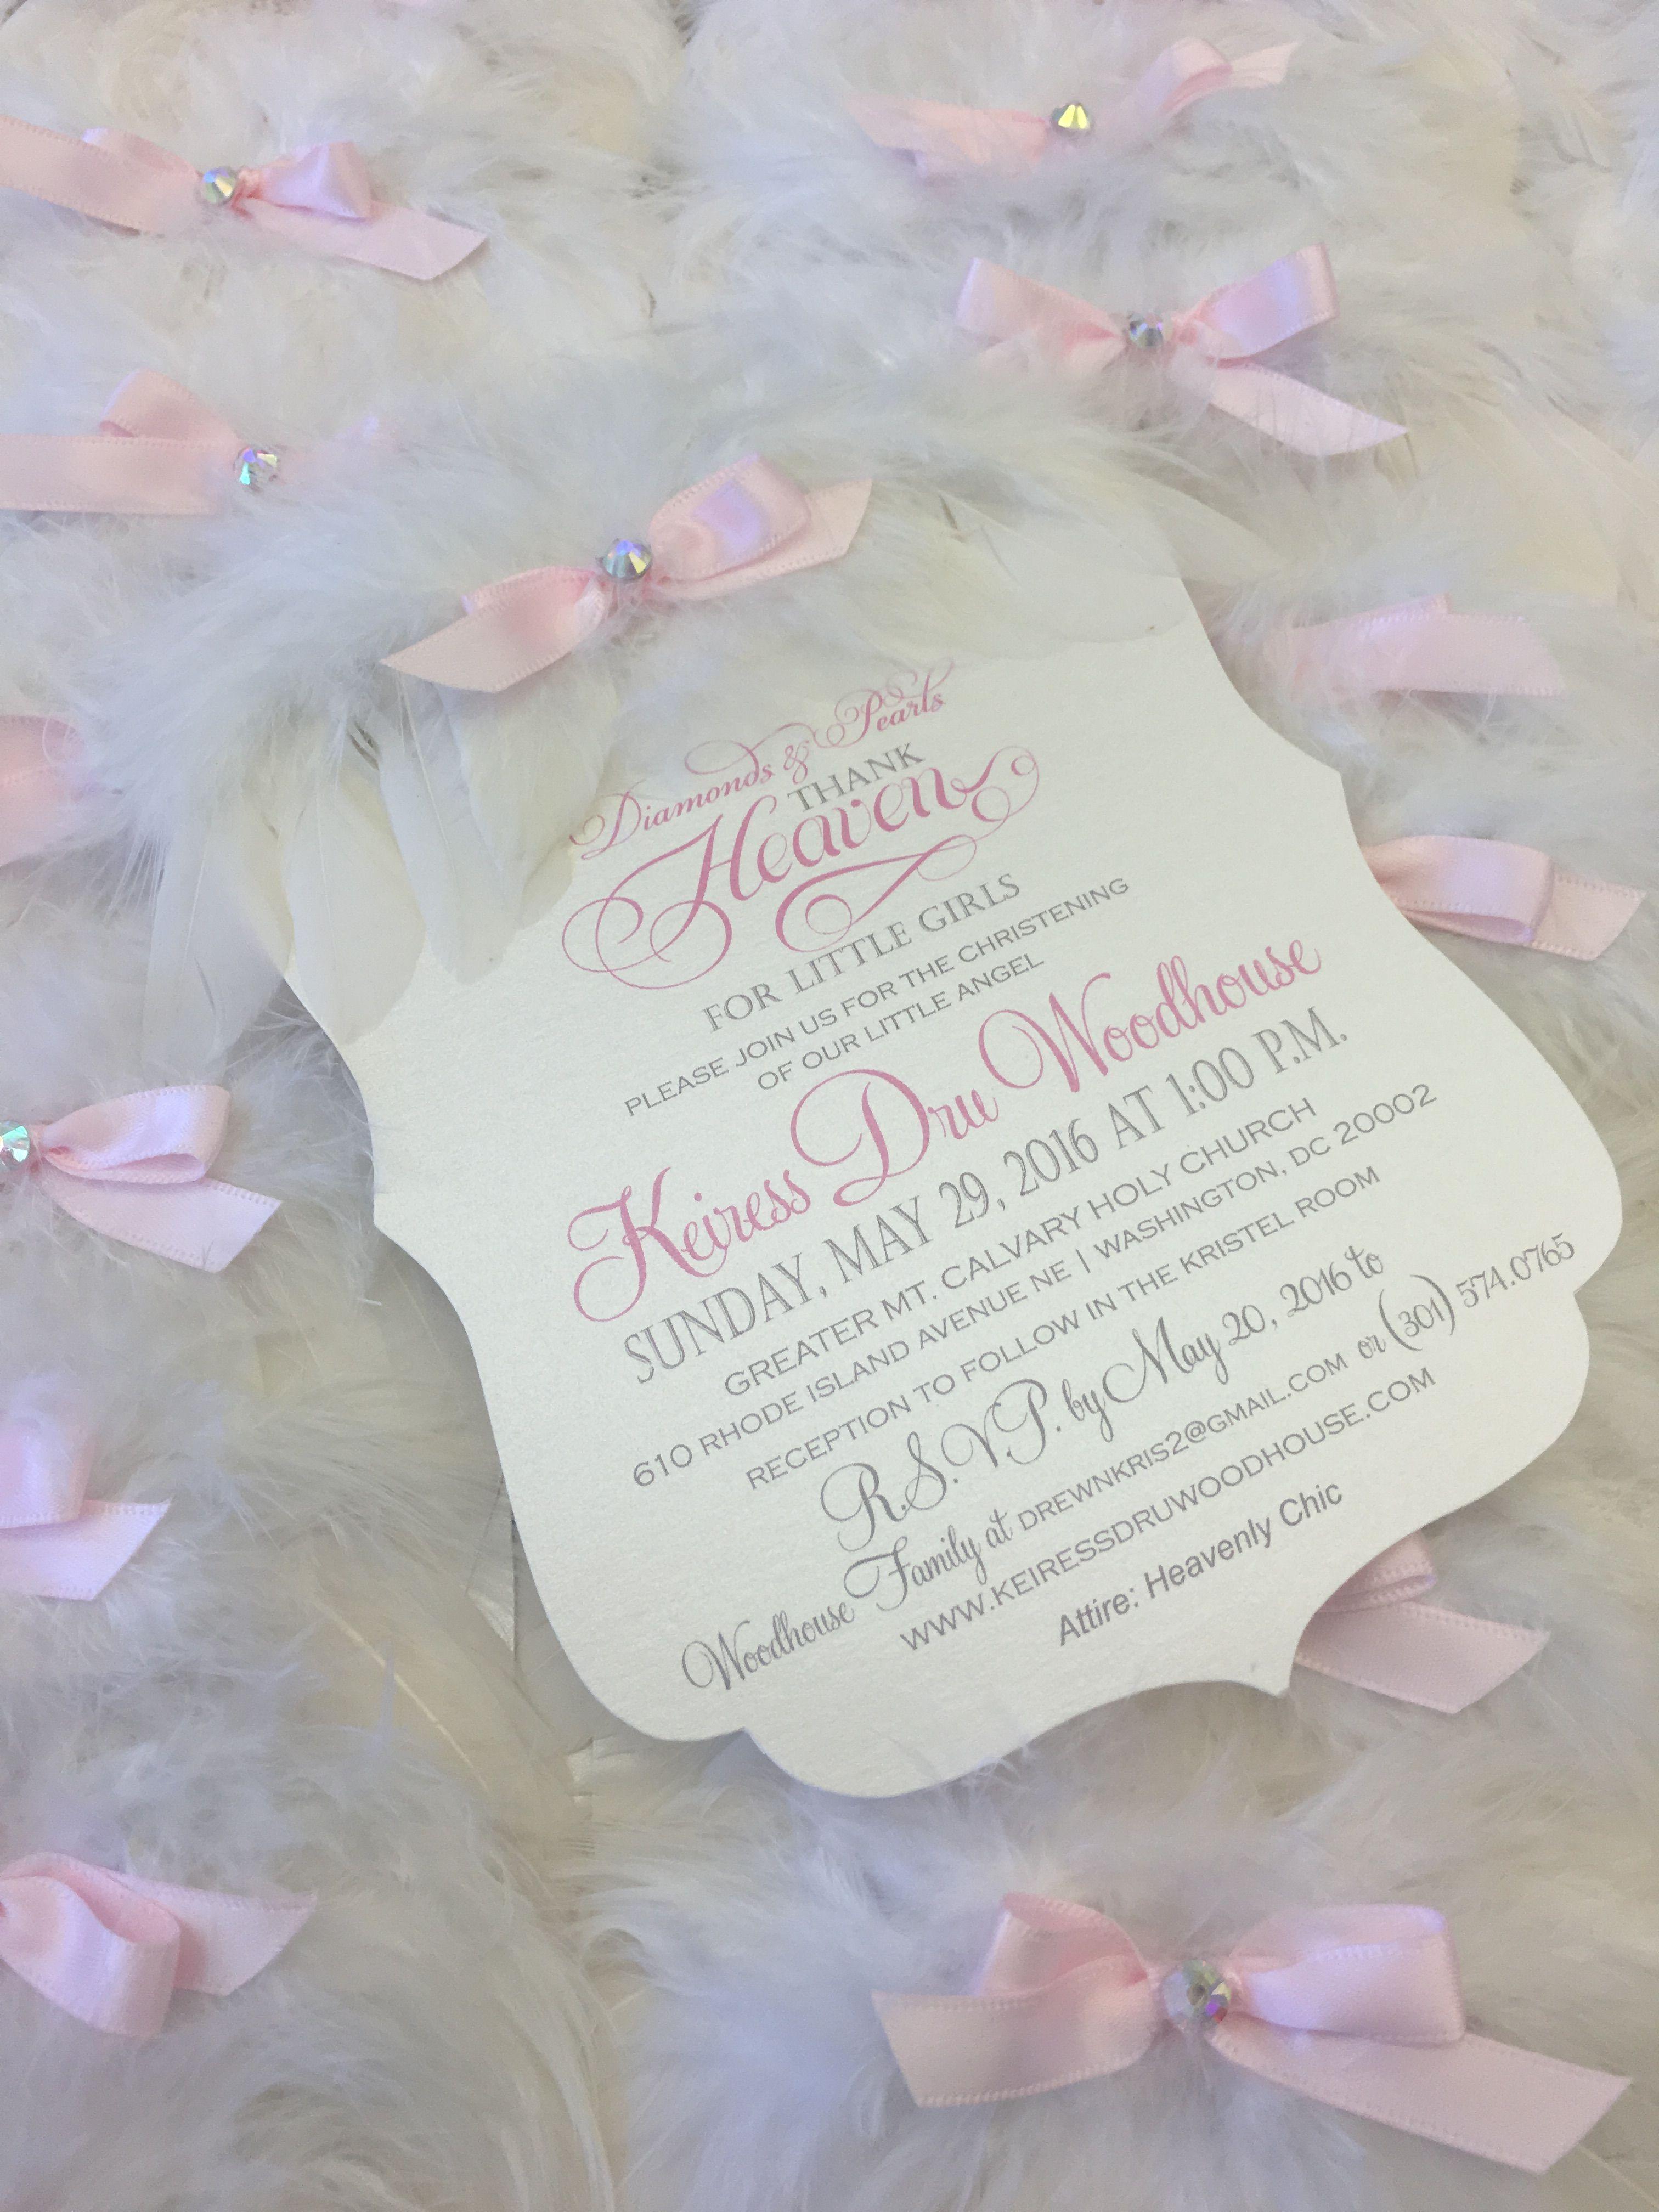 Angel wing christening invitation xo embellishments Thank